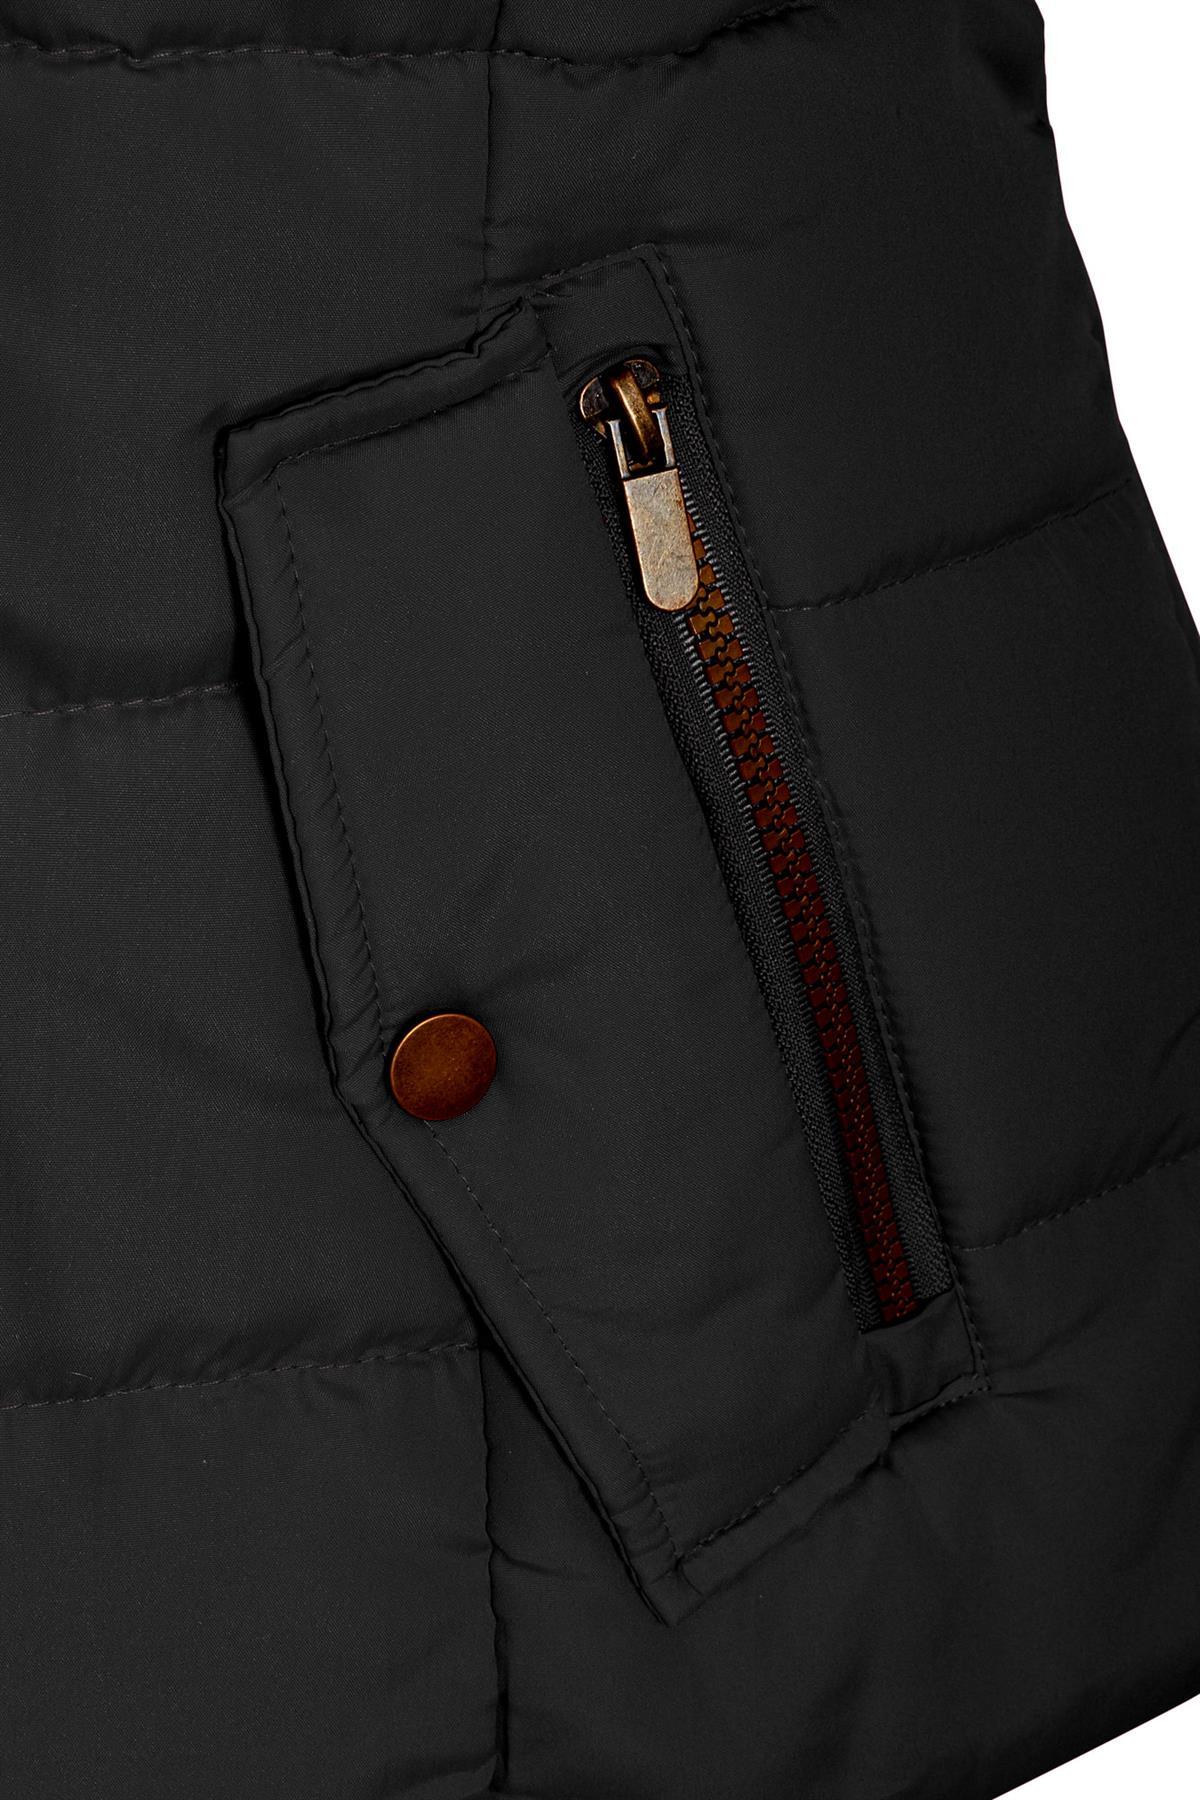 Shelikes-Ladies-Padded-Faux-Fur-Trim-Hood-Hooded-Jacket-Winter-Coat-Size-6-to-16 miniatuur 3